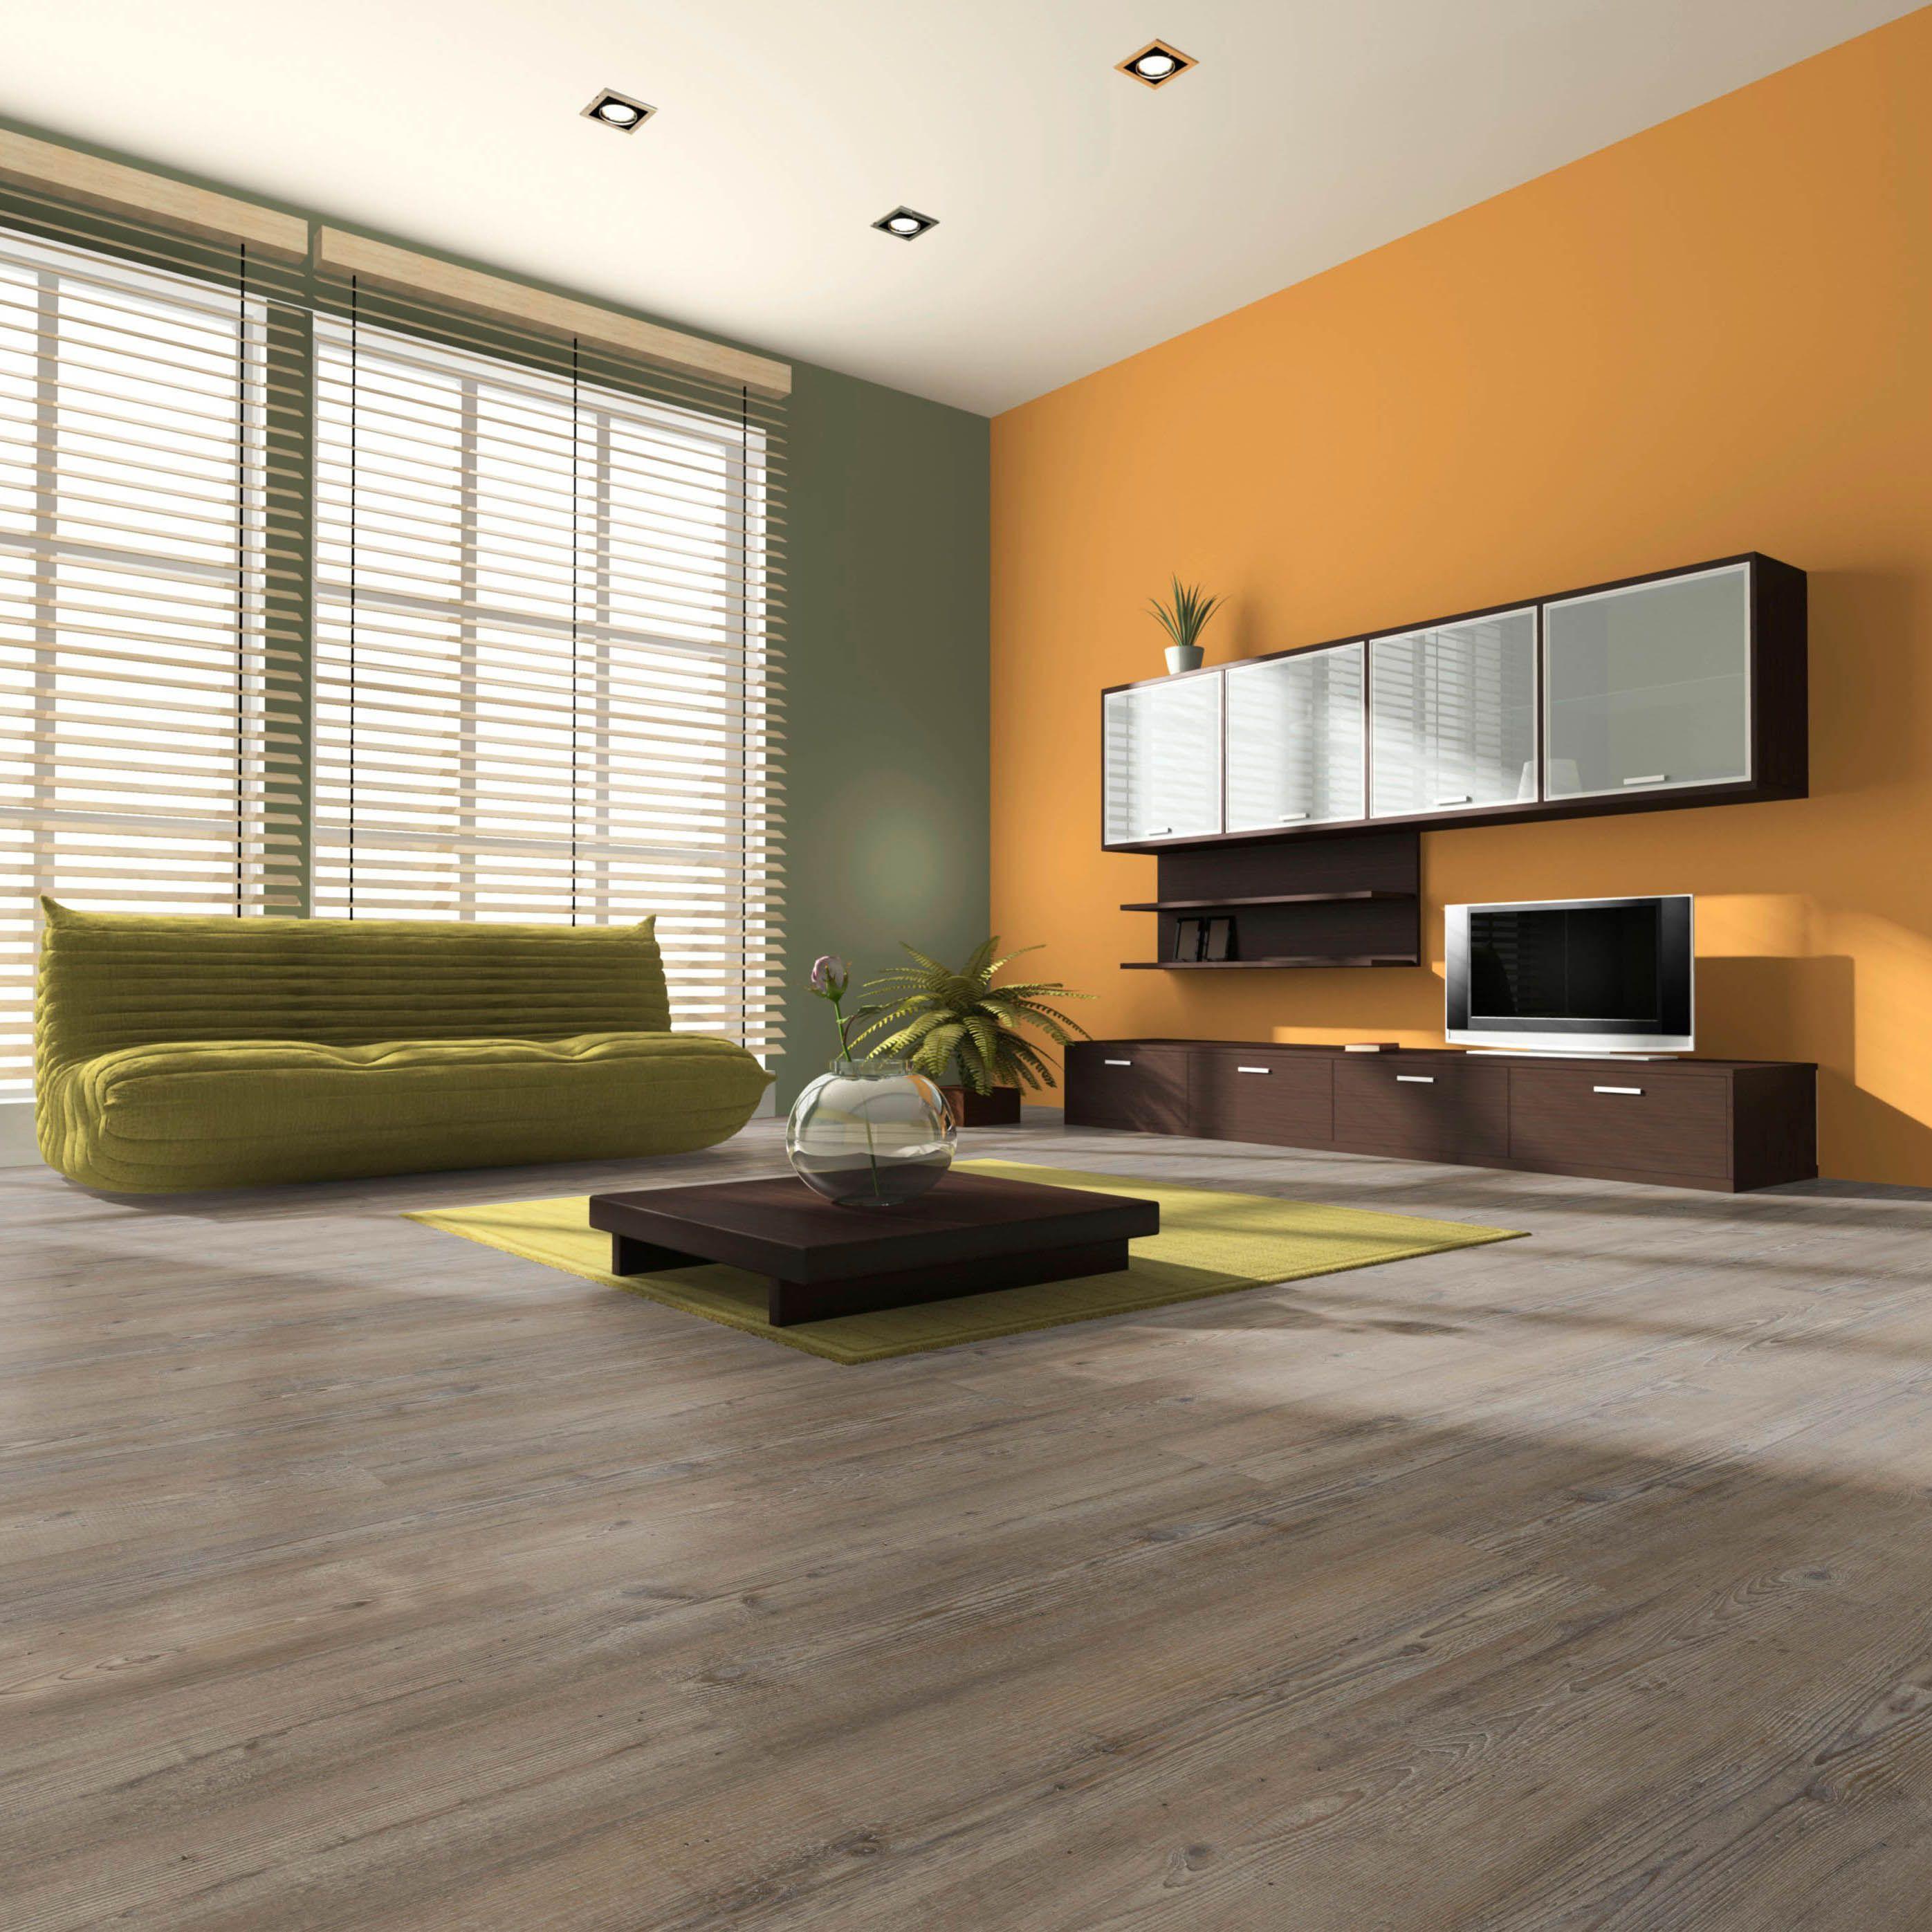 Belcanto Smoked Pine Effect Laminate Flooring 1.99 m² Pack ...